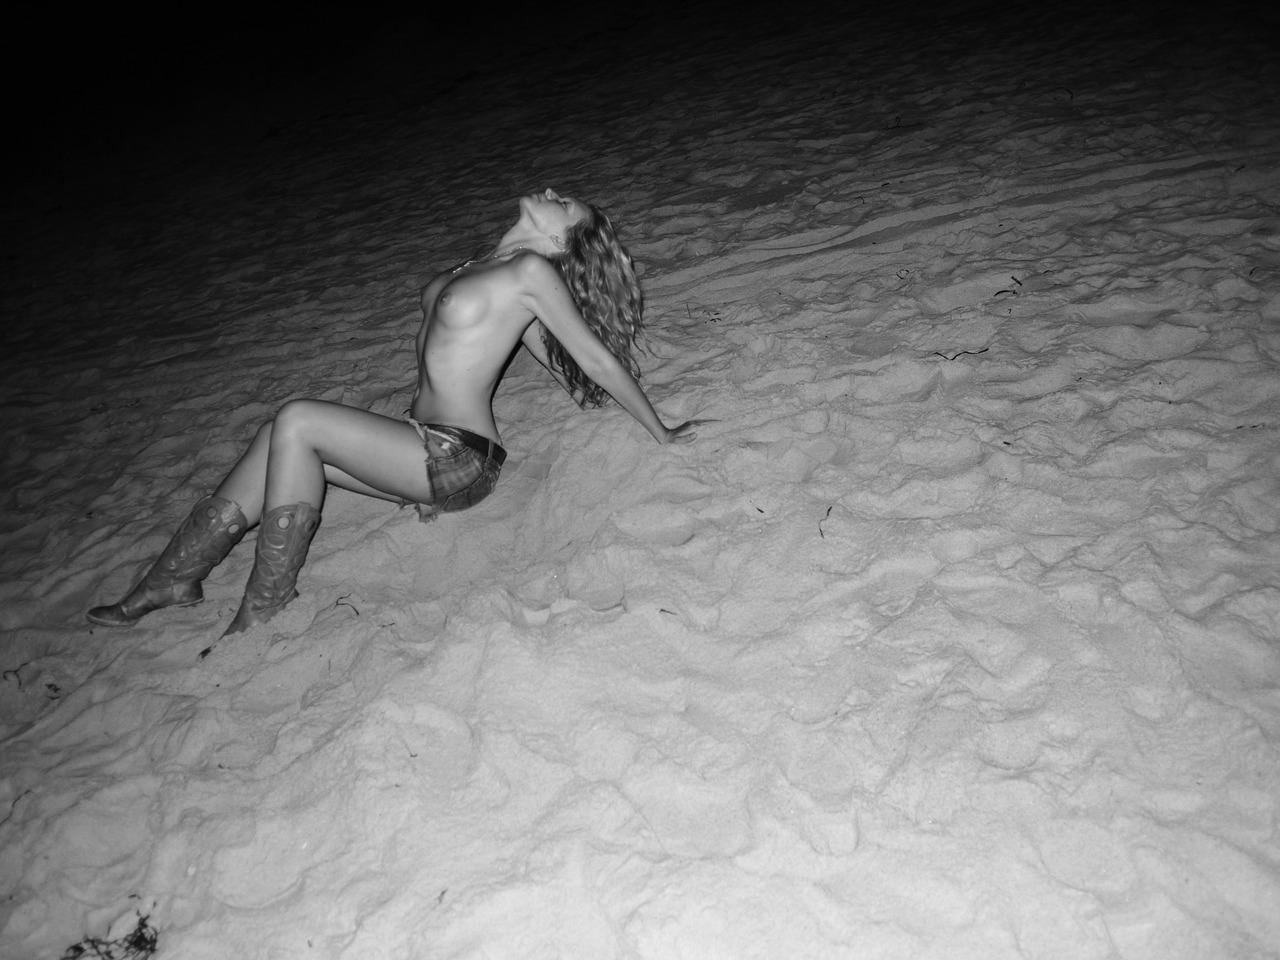 http://2.bp.blogspot.com/_FEkxtl1-FKs/THKPbBAlB8I/AAAAAAAAAFY/nBKohcNqPWY/s1600/An+American+dream,+Fire+Island.+Photo+Olivier+Zahm.jpg